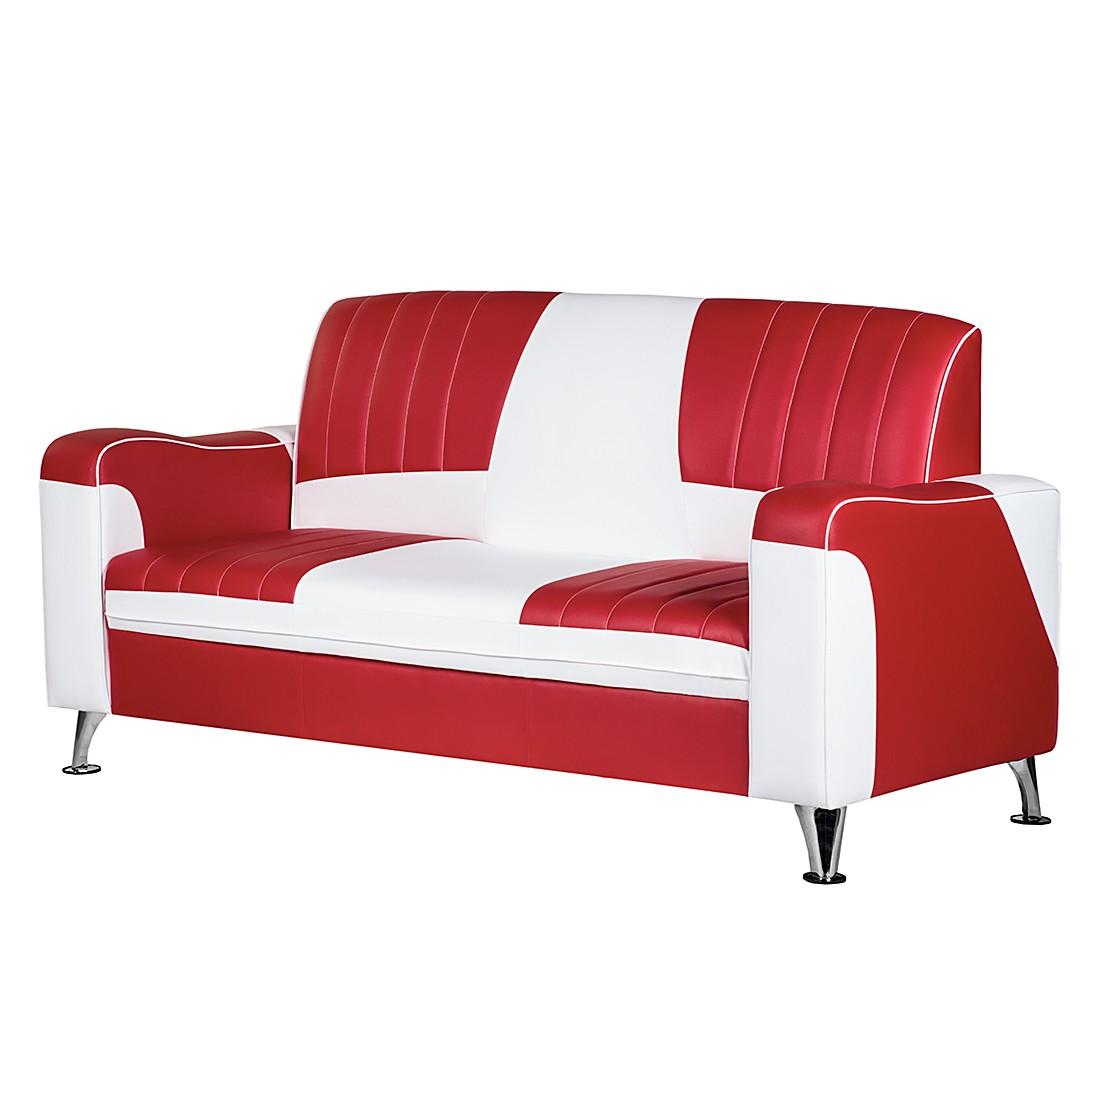 Sofa Reinigen Kunstleder Kunstleder Couch Perfect Kunstleder Sofa